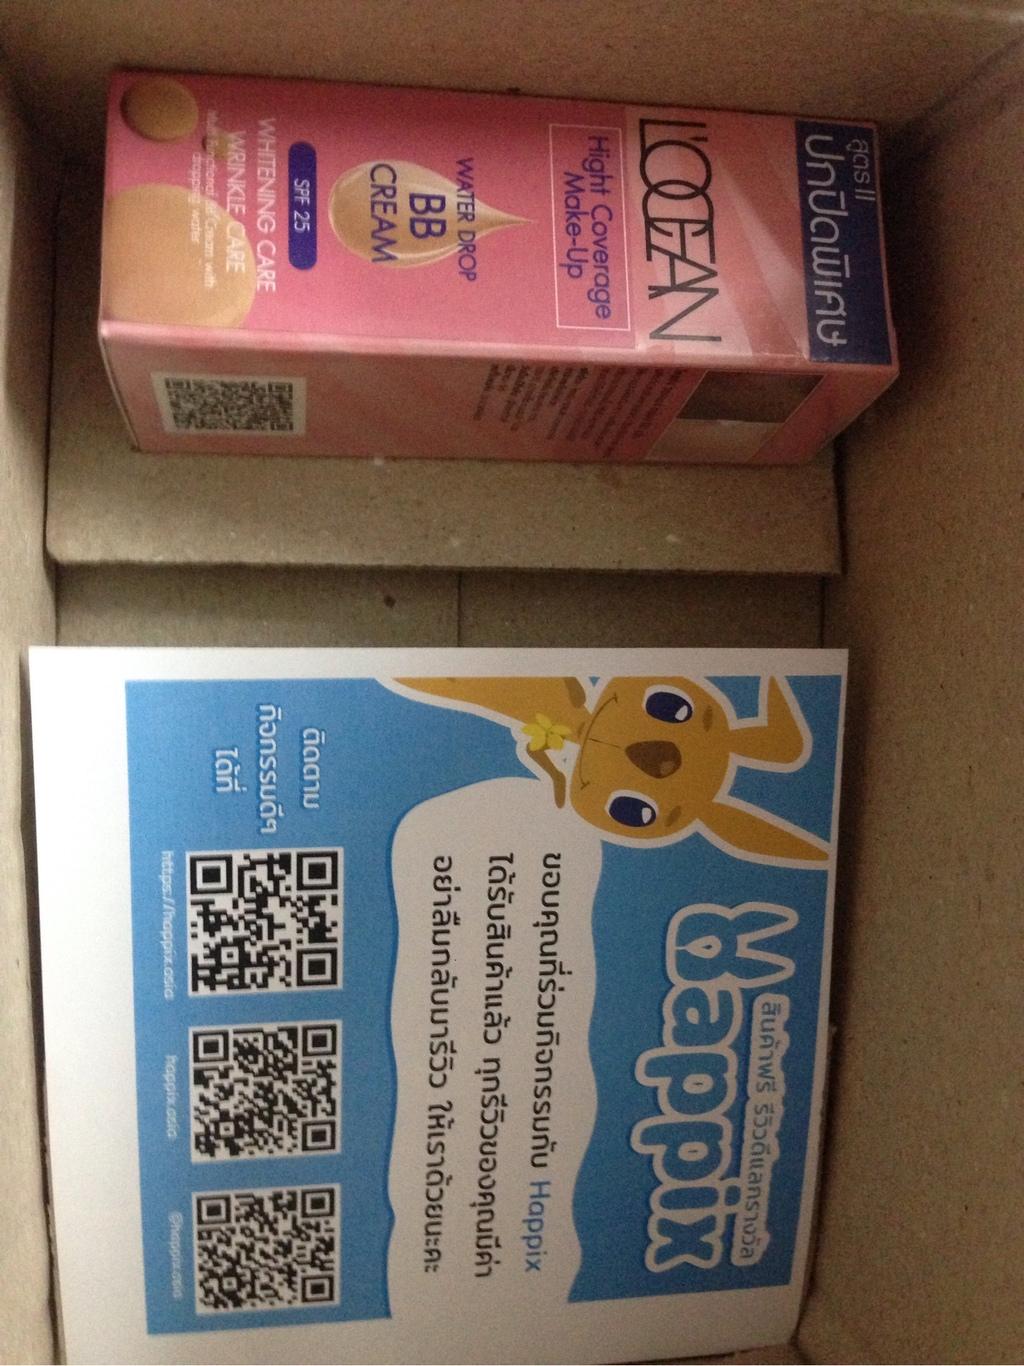 LOCEAN Waterdrop BB Cream สูตรปกปิดพิเศษ ปรับสภาพผิวหน้า  รีวิว